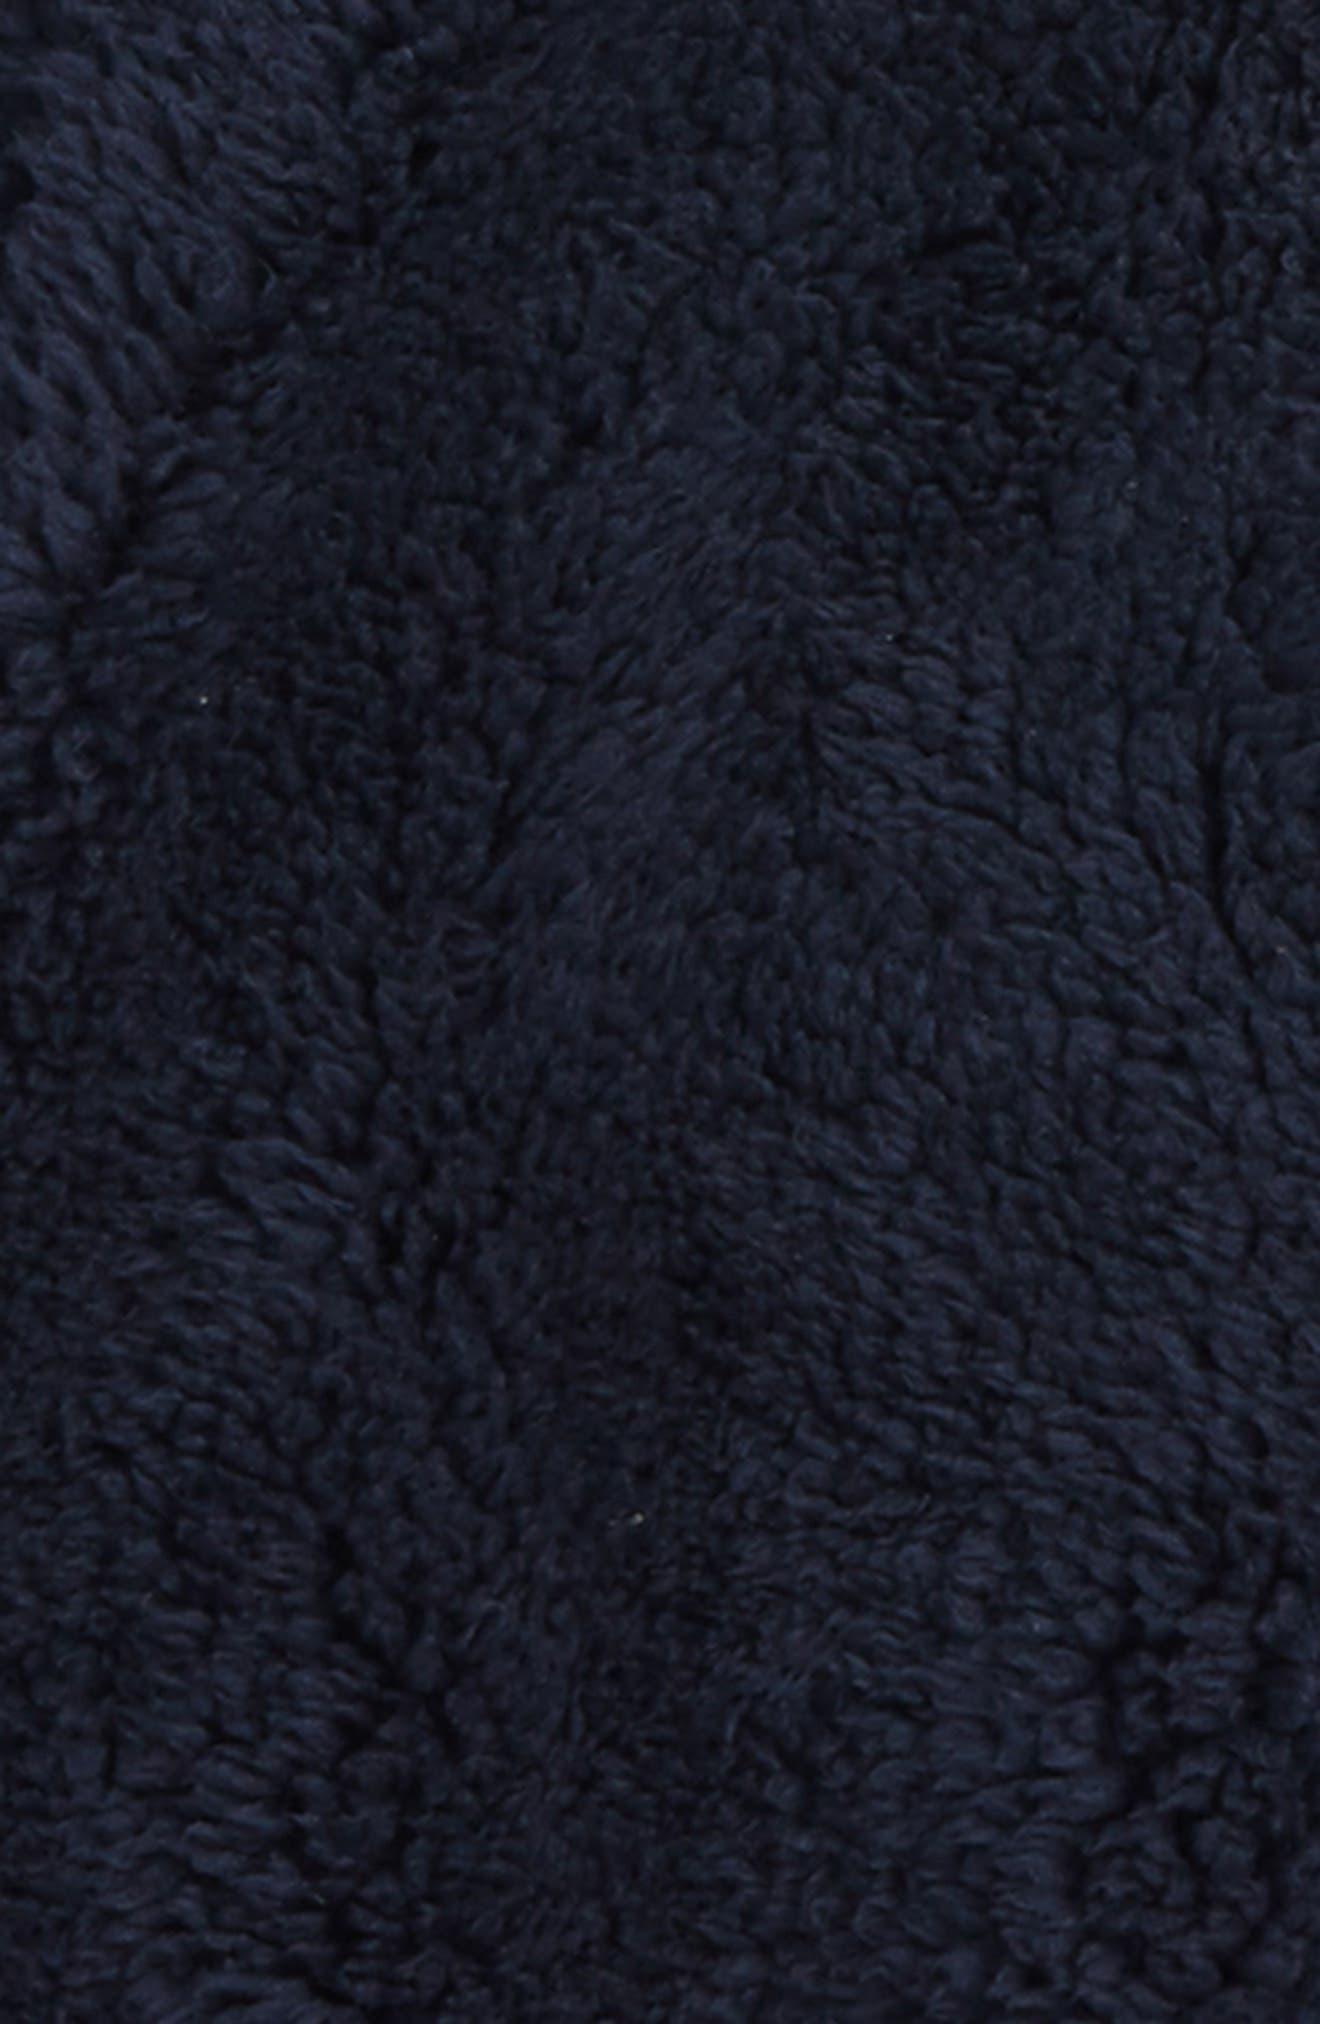 Alternate Image 3  - Mini Boden Reversible Quarter Zip Sweatshirt (Toddler Boys, Little Boys & Big Boys)